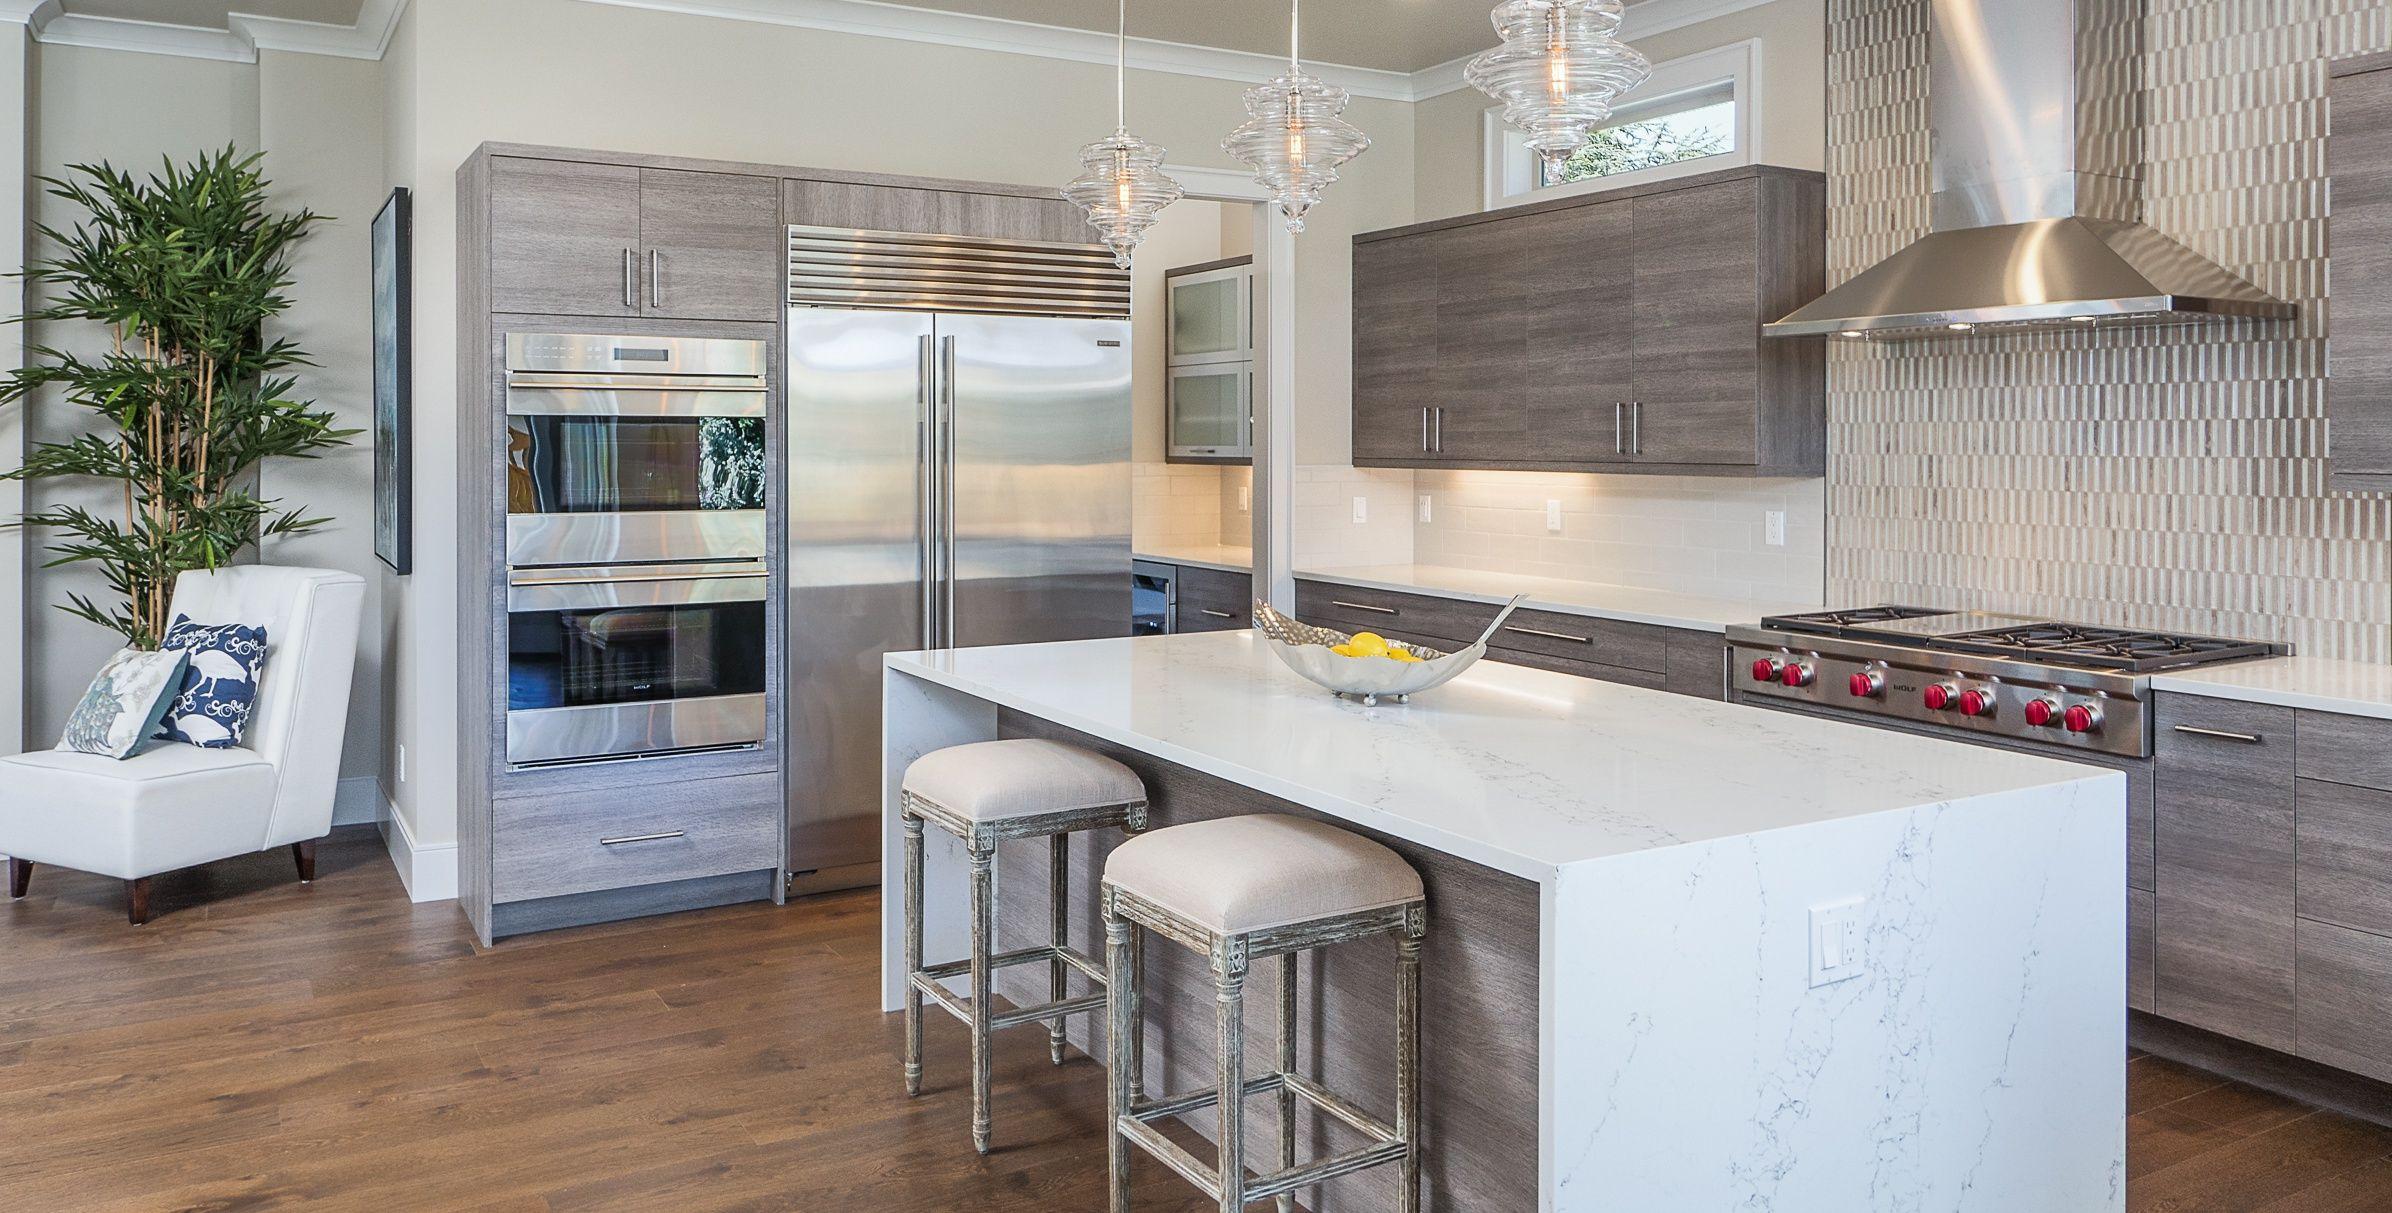 Alba Kitchen Cabinets Bath Design Center New Jersey Vr From Custom Kitchen And Bath Design Center Inspiration Design